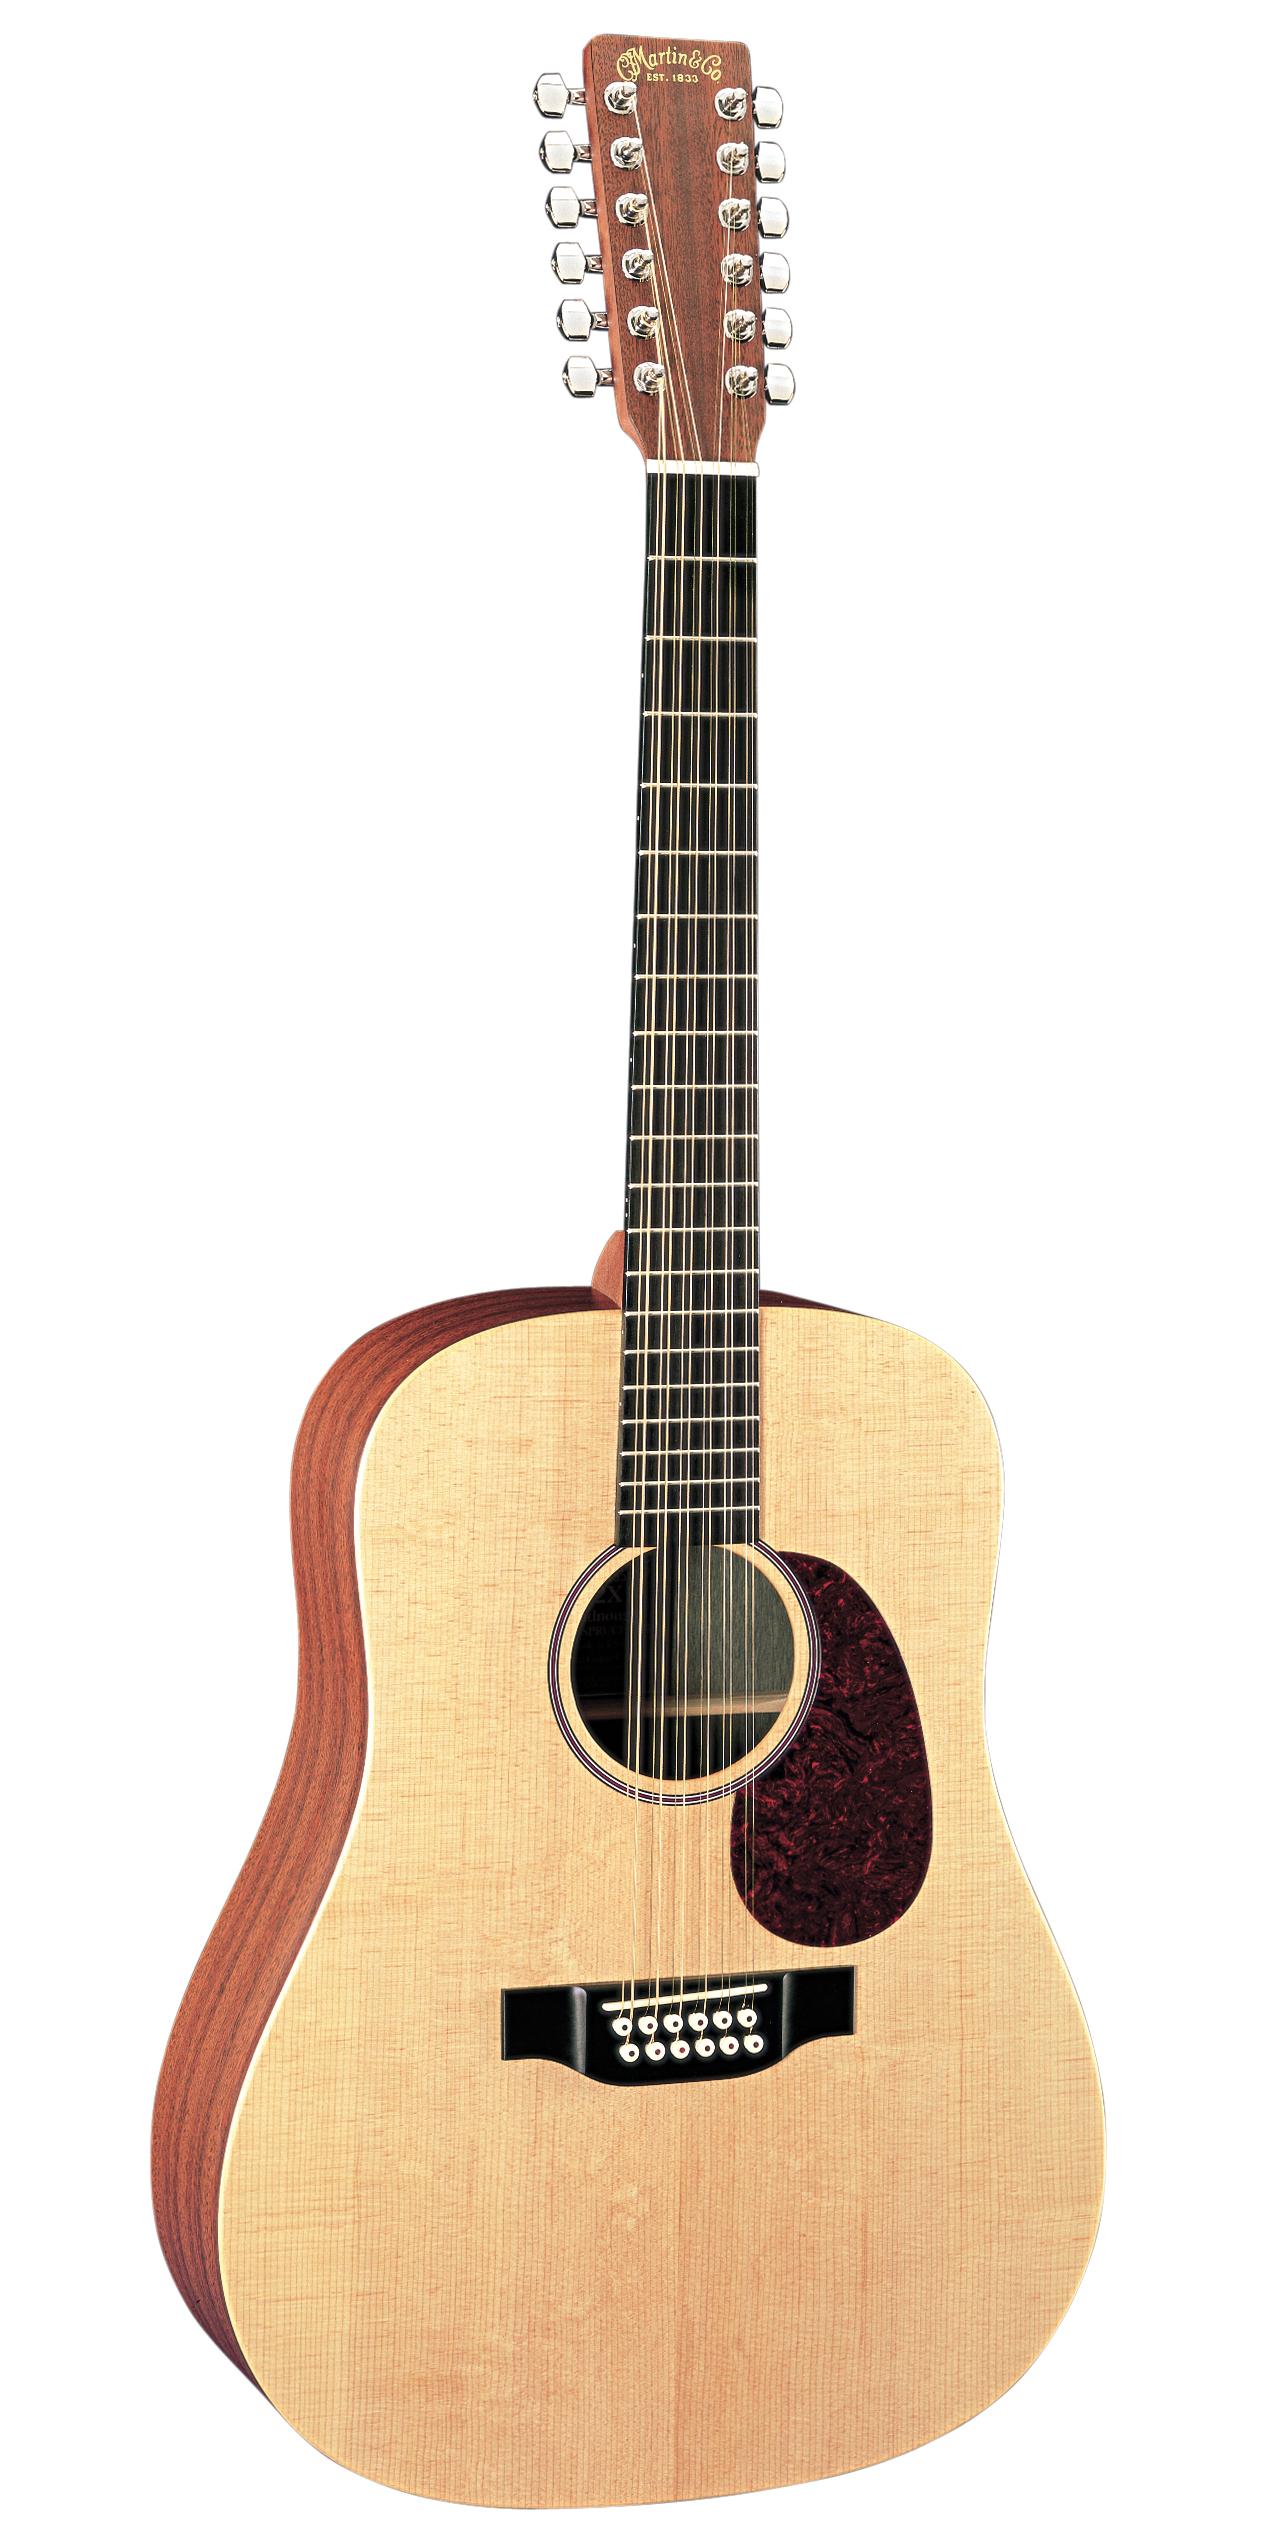 musicworks guitars acoustic electric guitars acoustic electric guitar martin 12 string. Black Bedroom Furniture Sets. Home Design Ideas